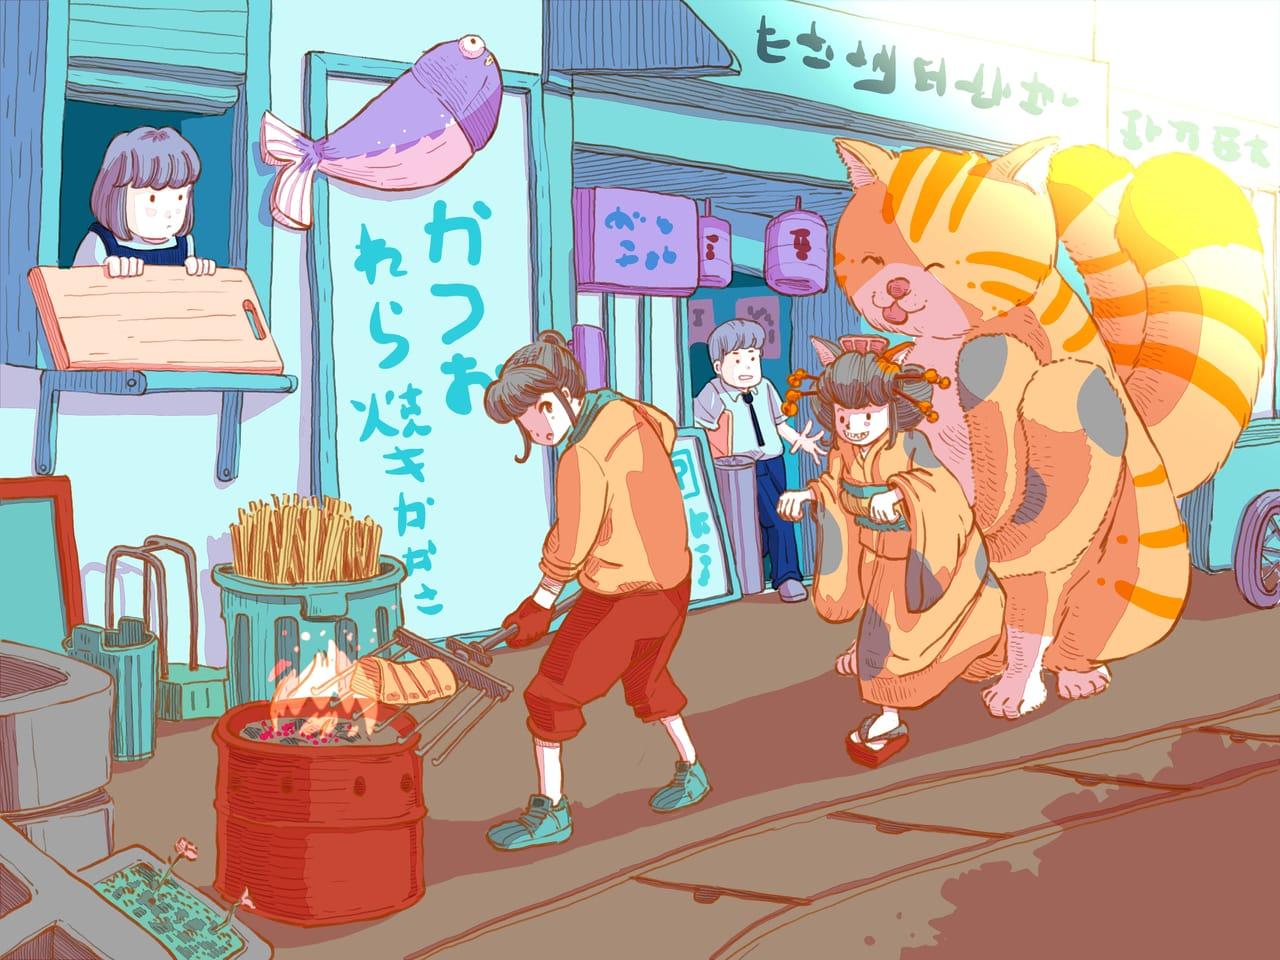 Katsuo restuarant and nekomata Illust of Wutikai February2021_Fantasy January2021_Contest:OC food cat cutegirl Japanese_style cute girl Restaurant youkai city fish cat_ears